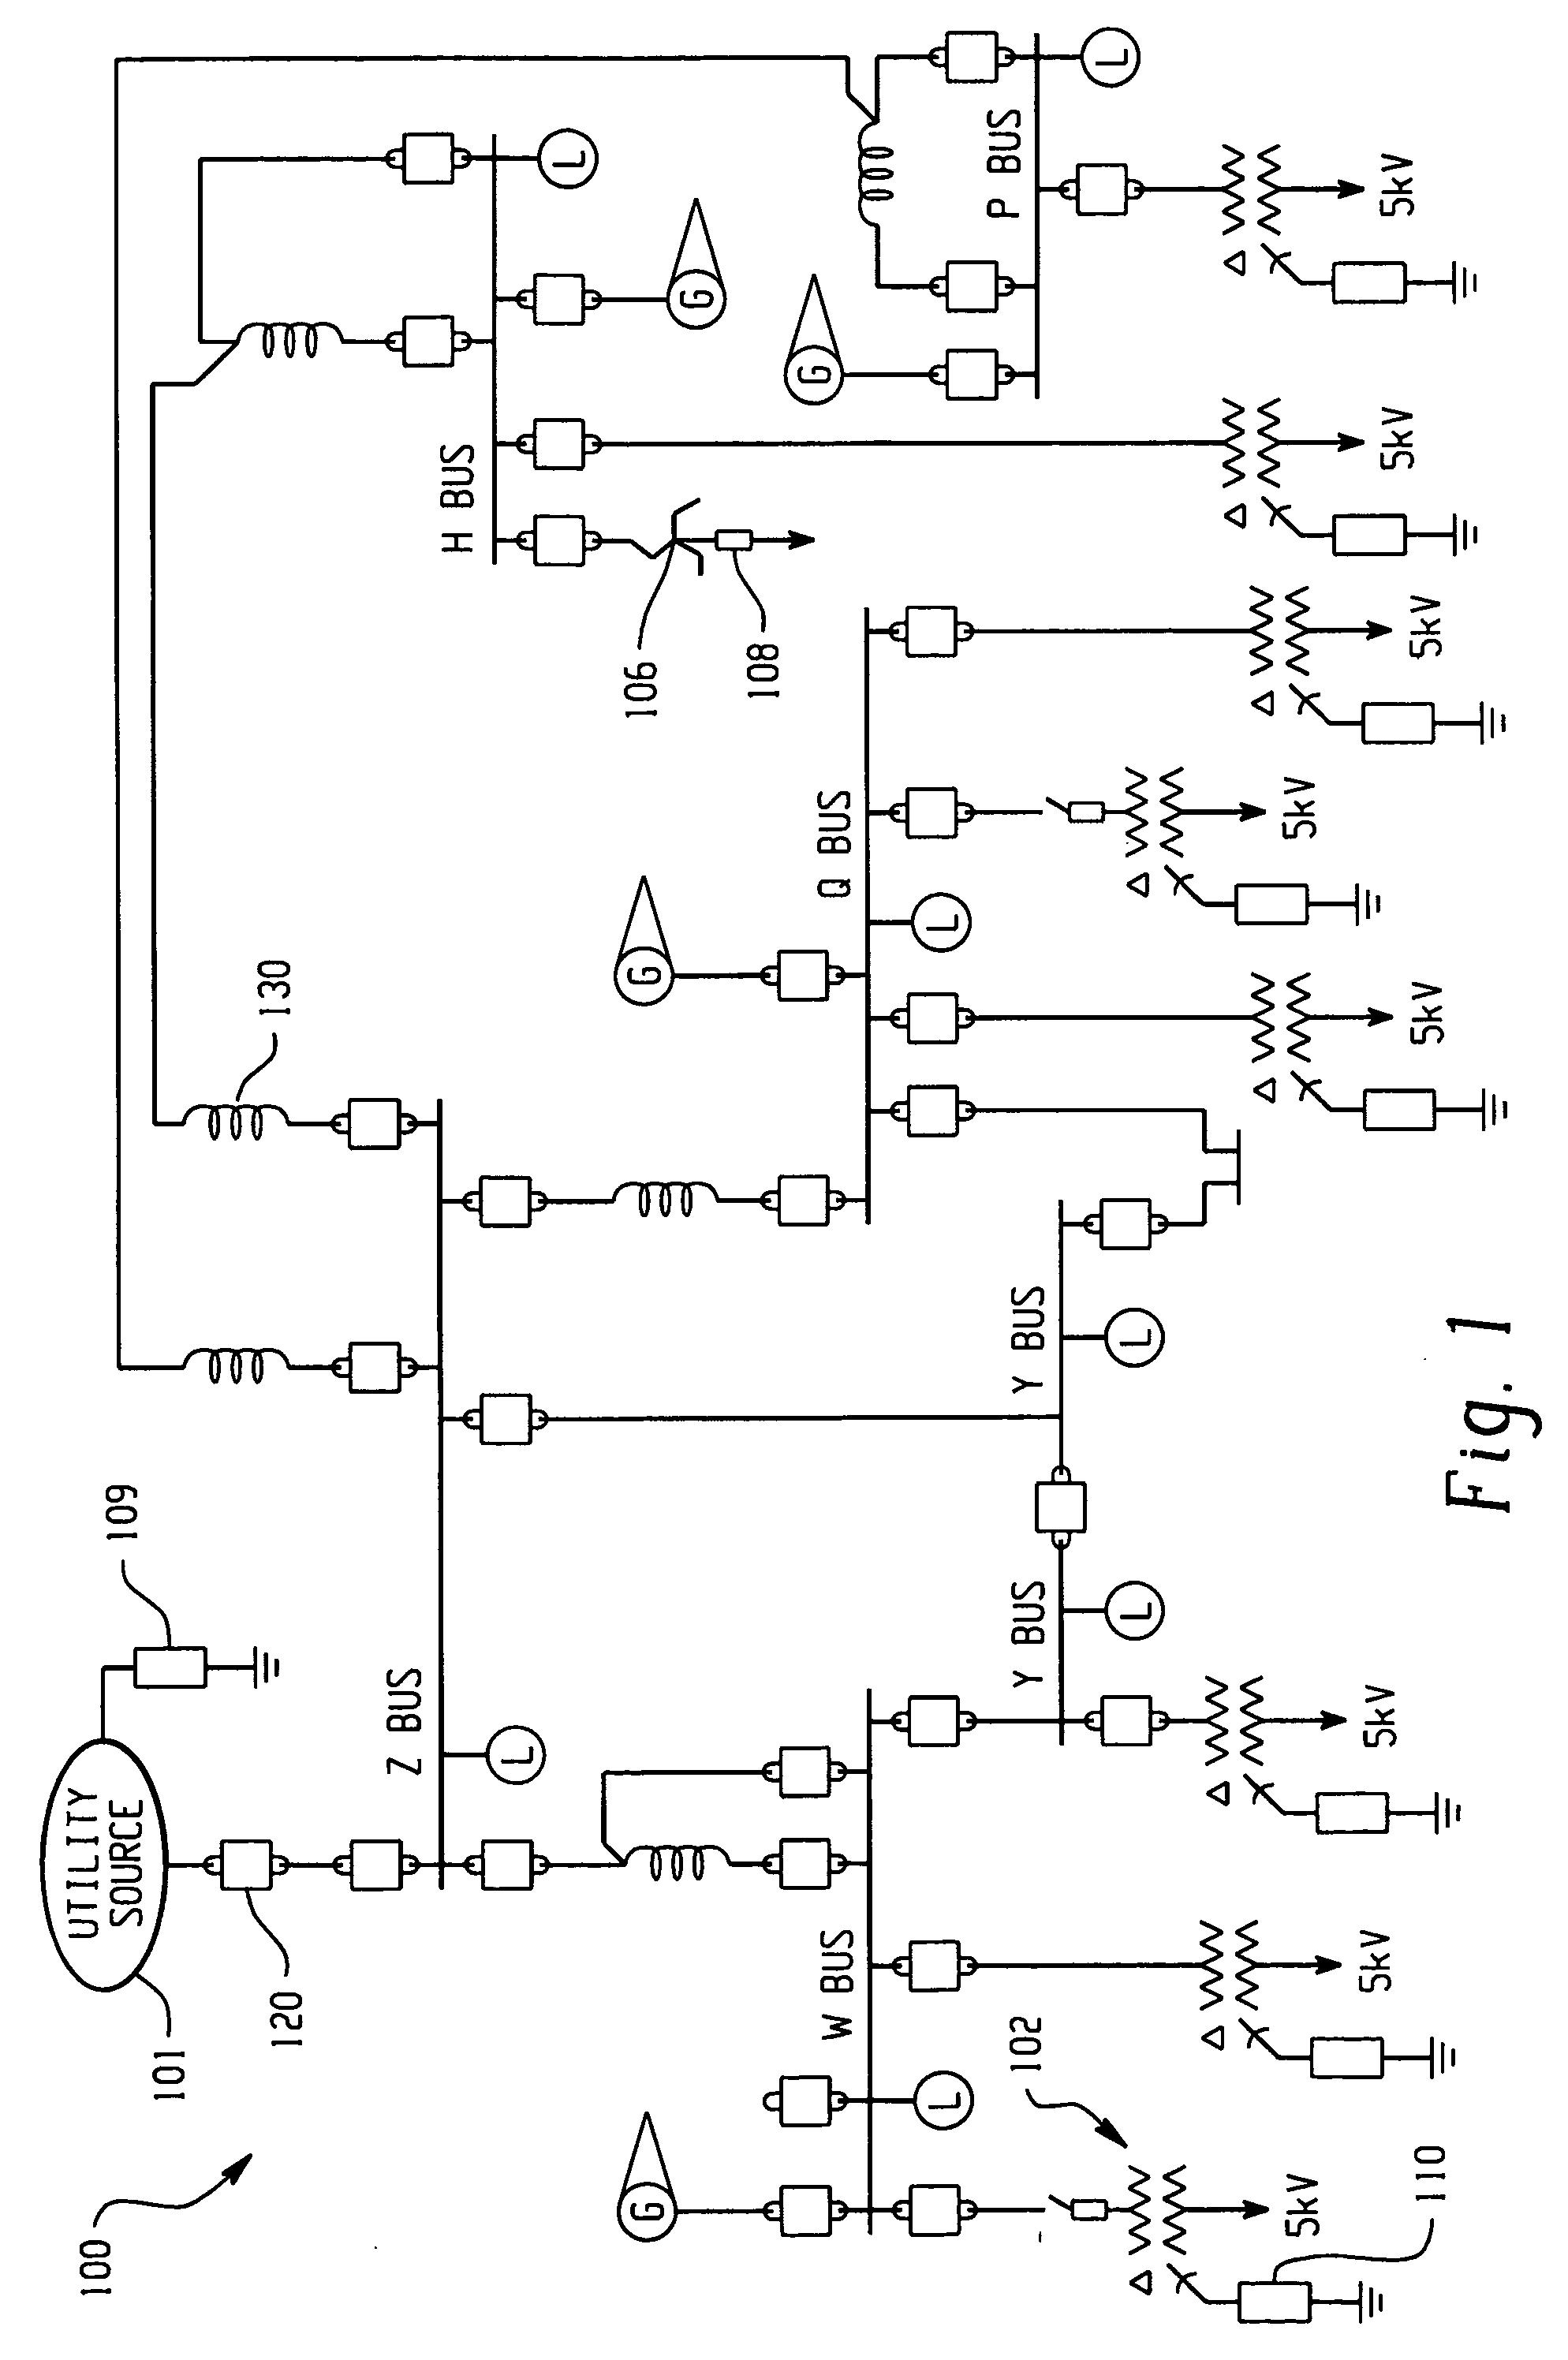 Sel 351 Wiring Diagram